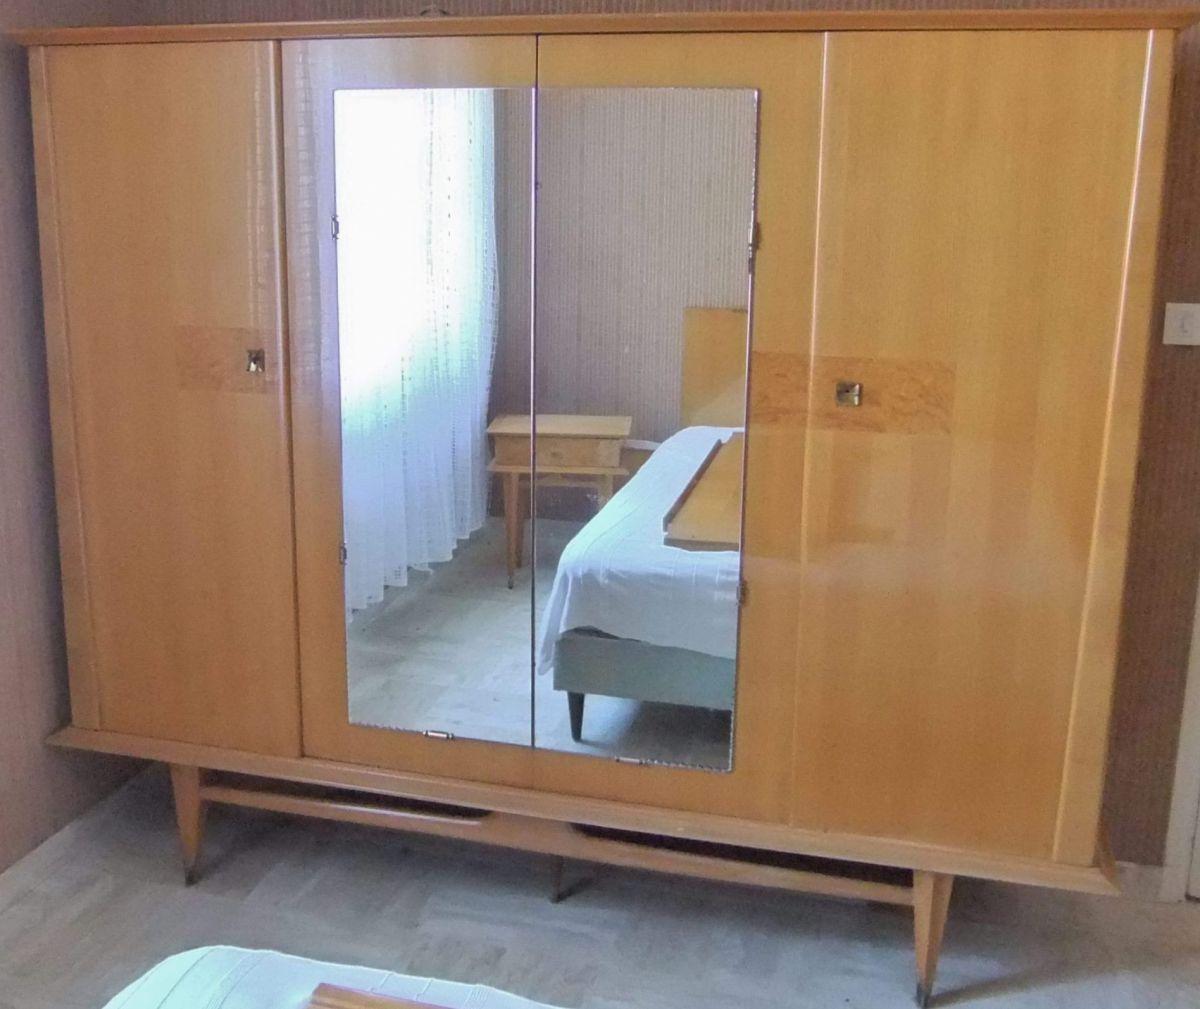 armoire 4 portes haut de gamme scandinave annees 50 60 luckyfind. Black Bedroom Furniture Sets. Home Design Ideas